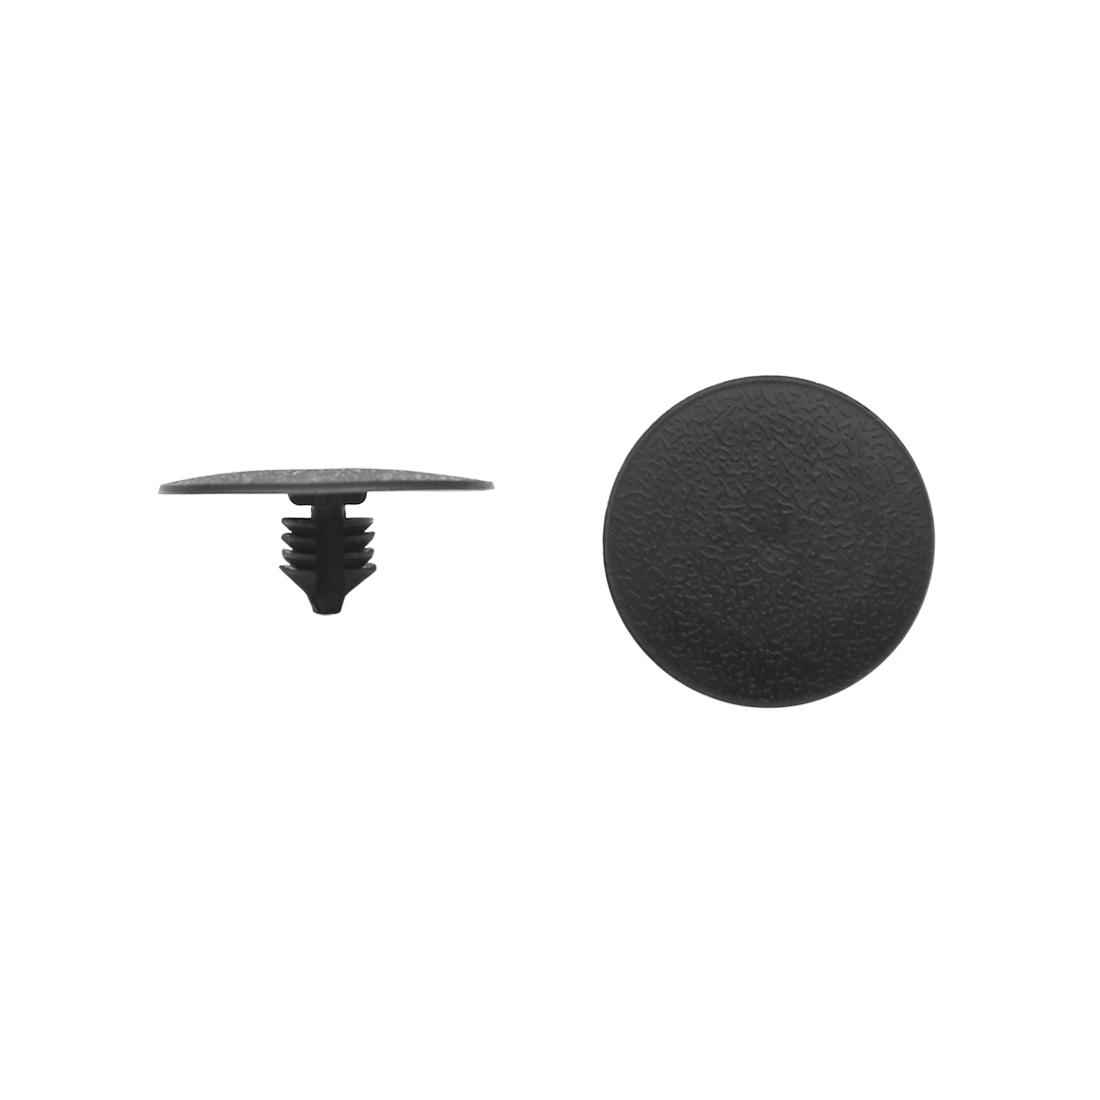 30pcs 8mm Hole Car Plastic Clips Rivet Fit Boot Trim Panel Pin Fender Black